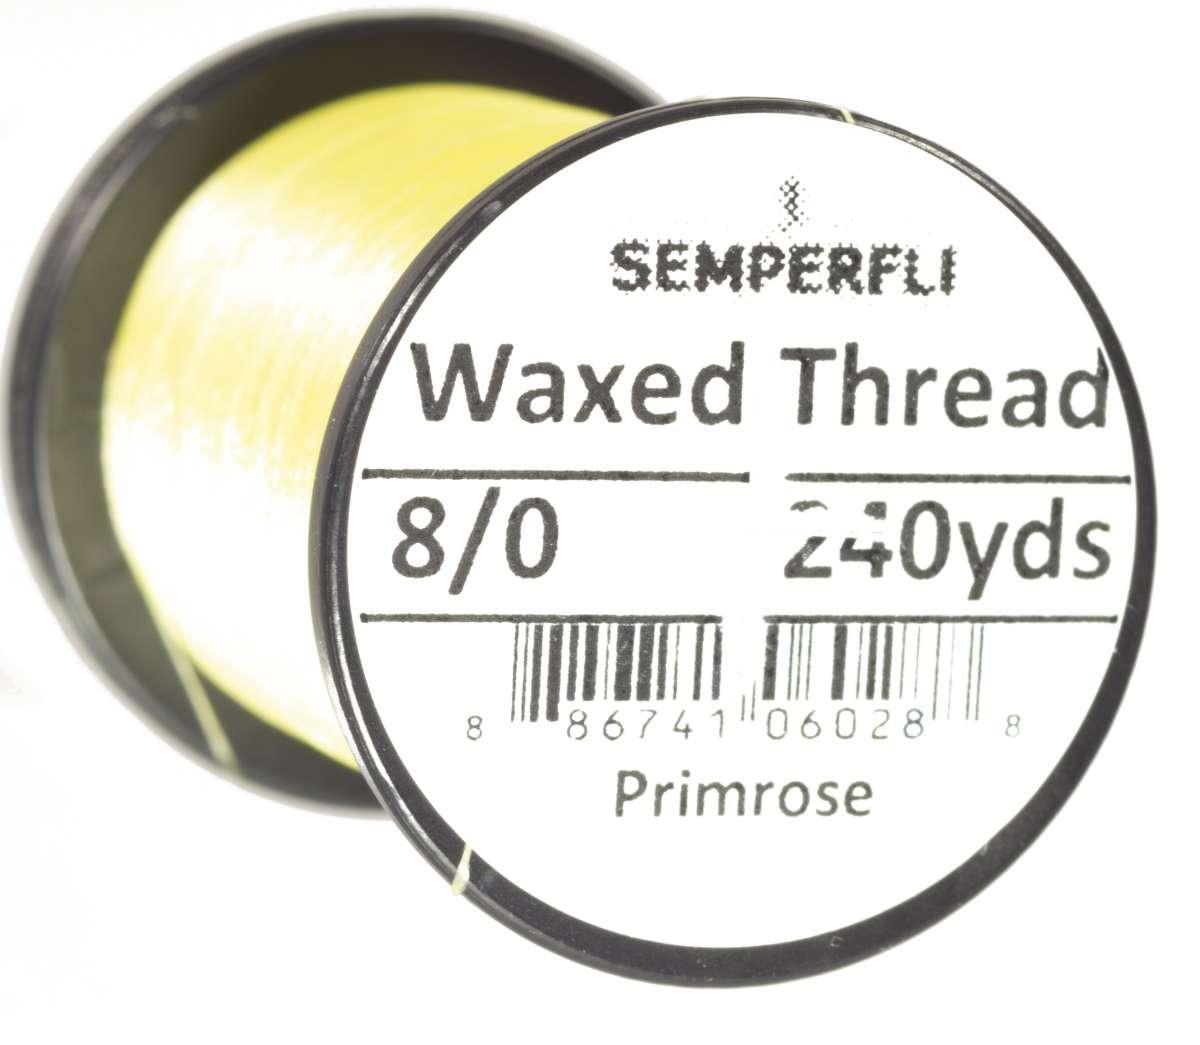 8/0 Classic Waxed Thread Primrose Sem-0400-1432